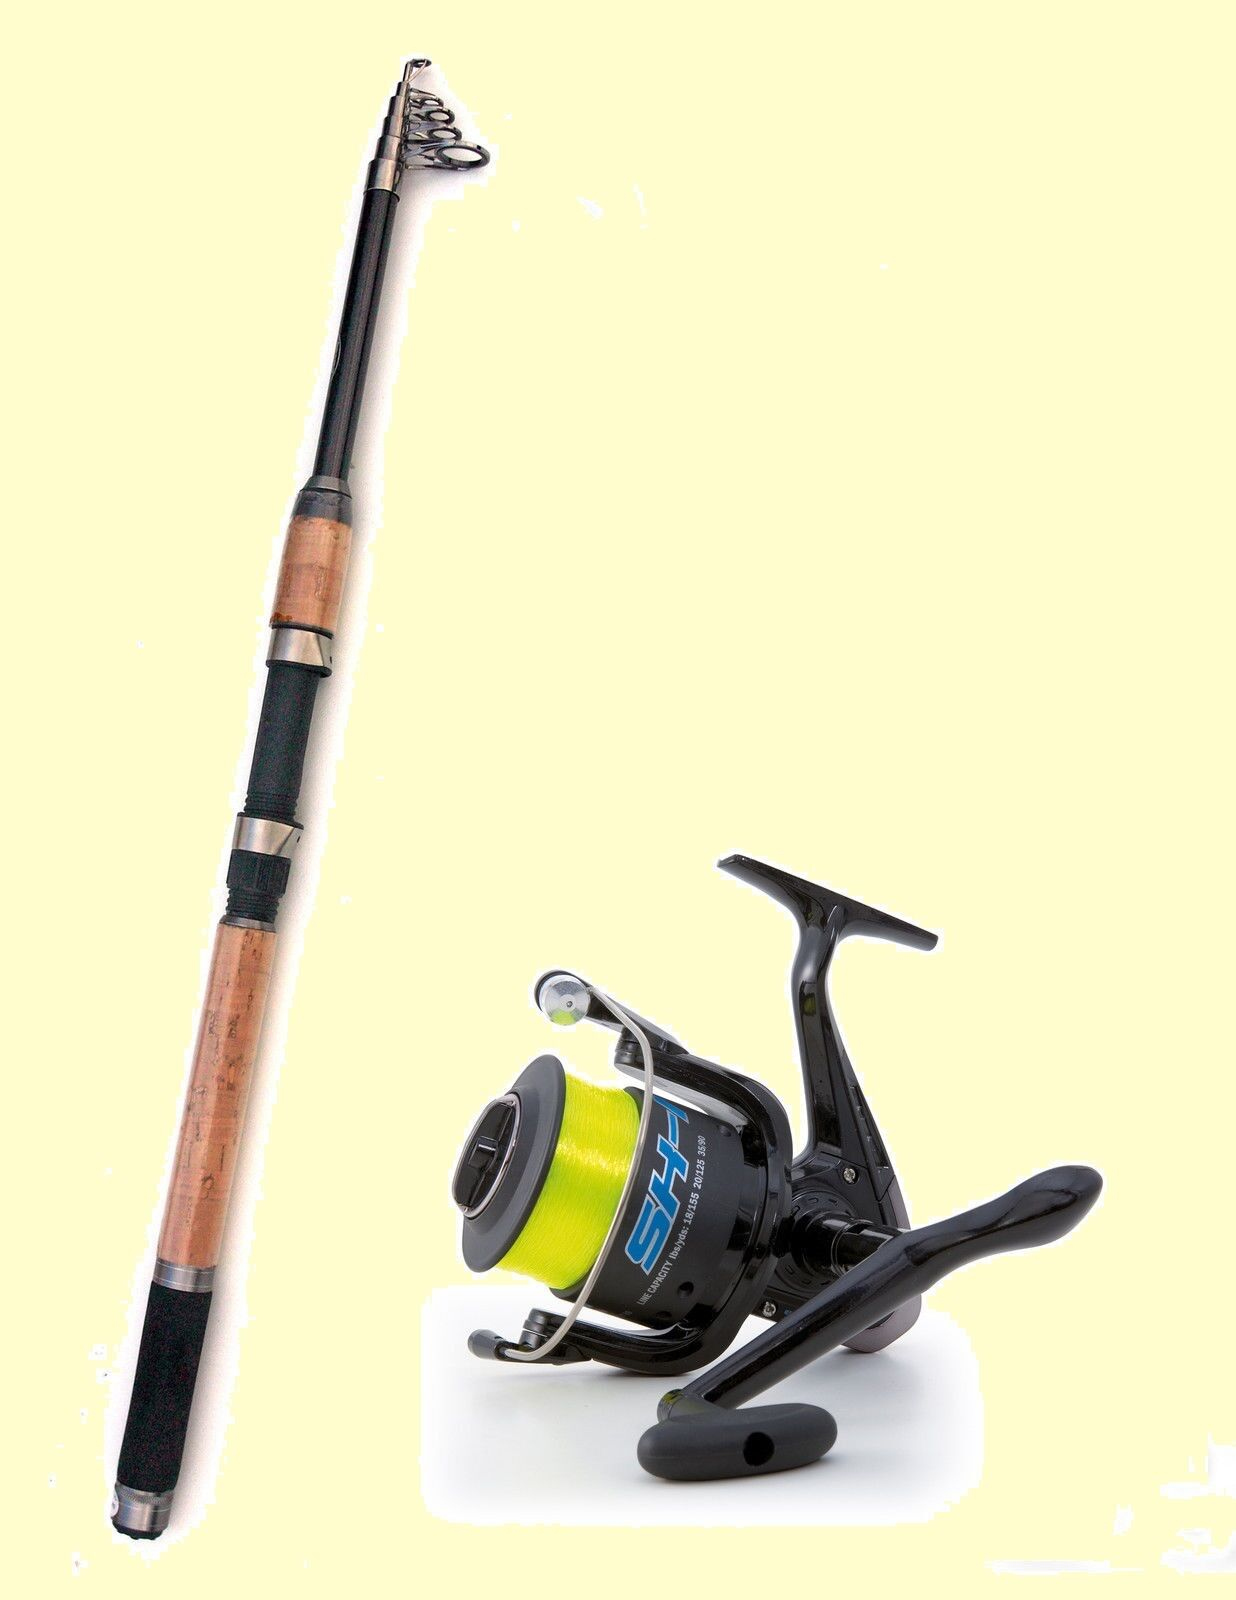 Lineaeffe Carbon Telescopic Travel  Pike Fishing Rod & Shizuka 1 Reel with Line